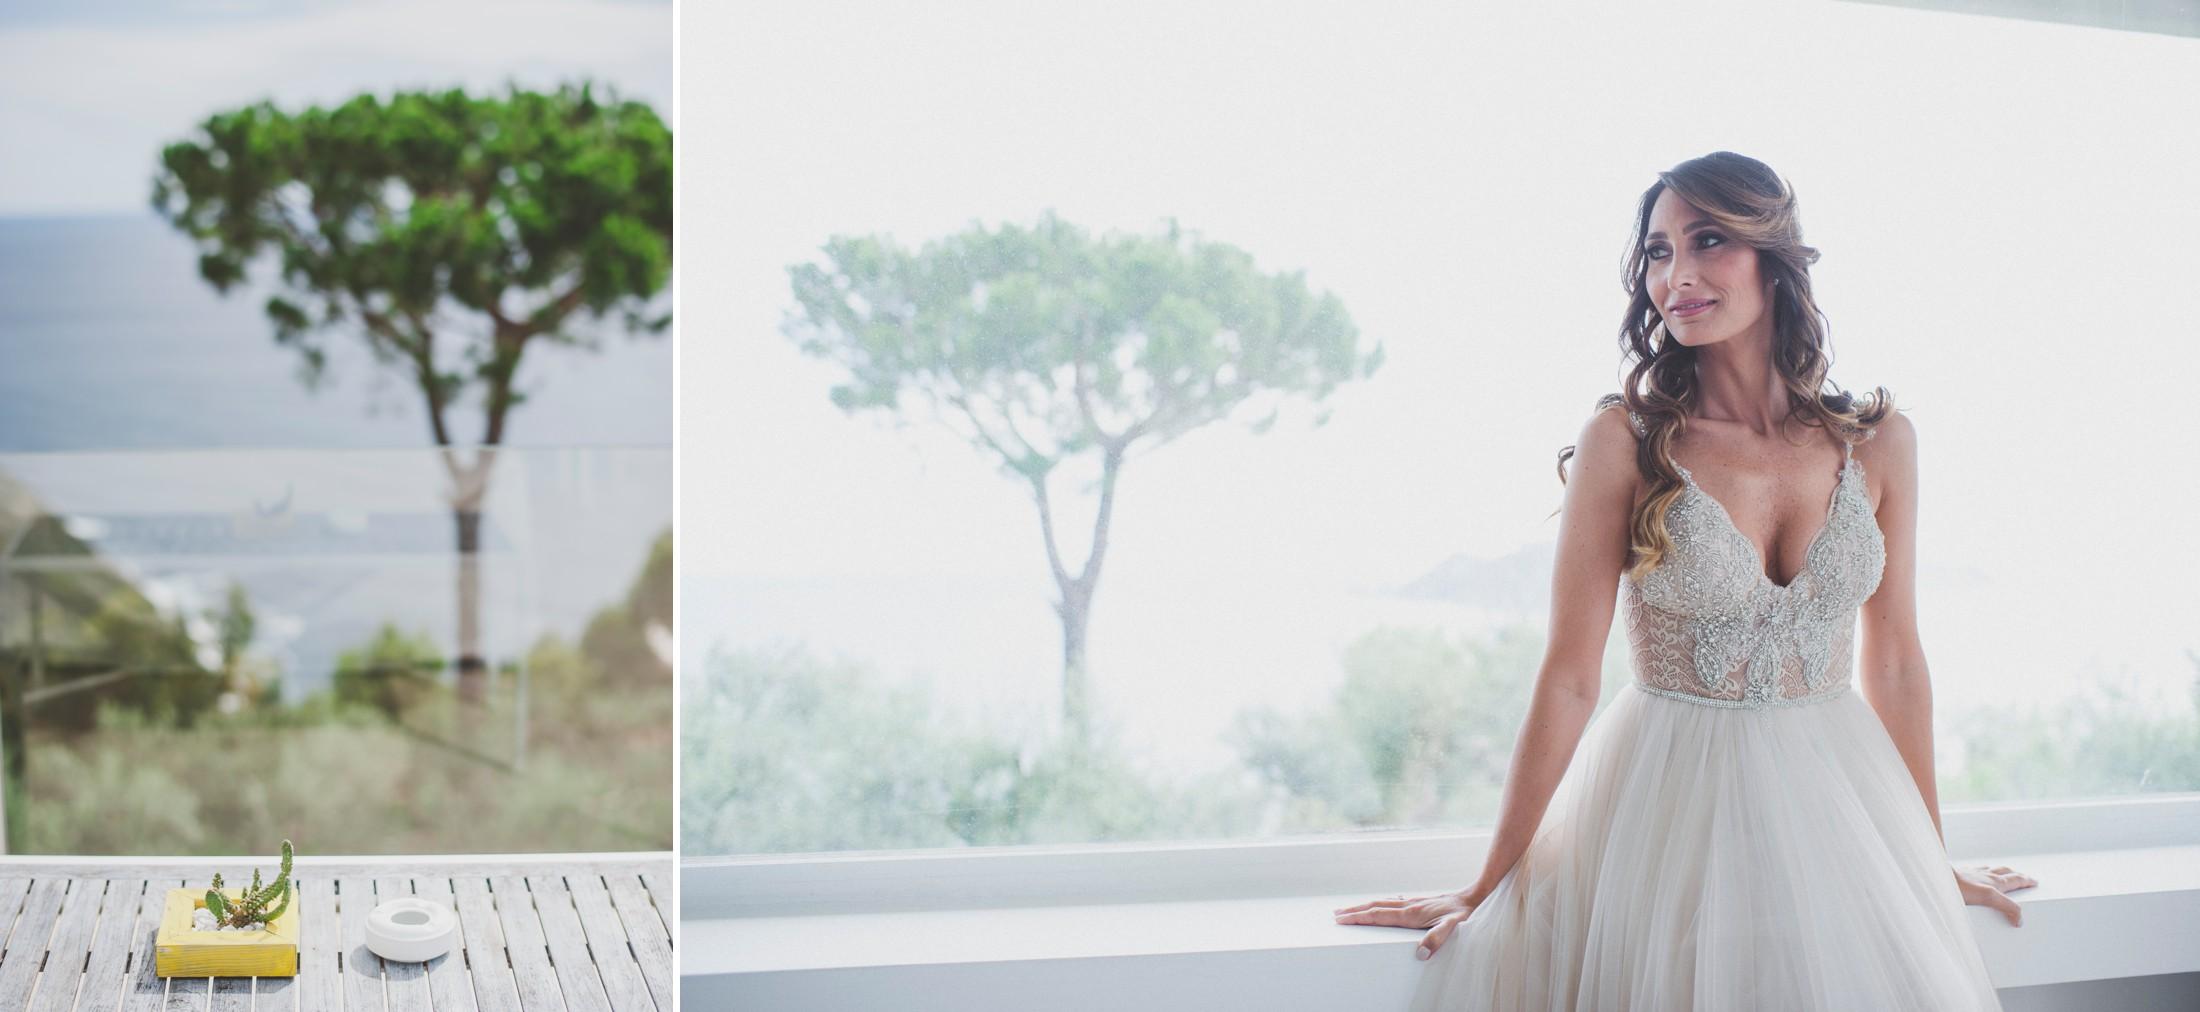 sorrento wedding collage bride's portrait